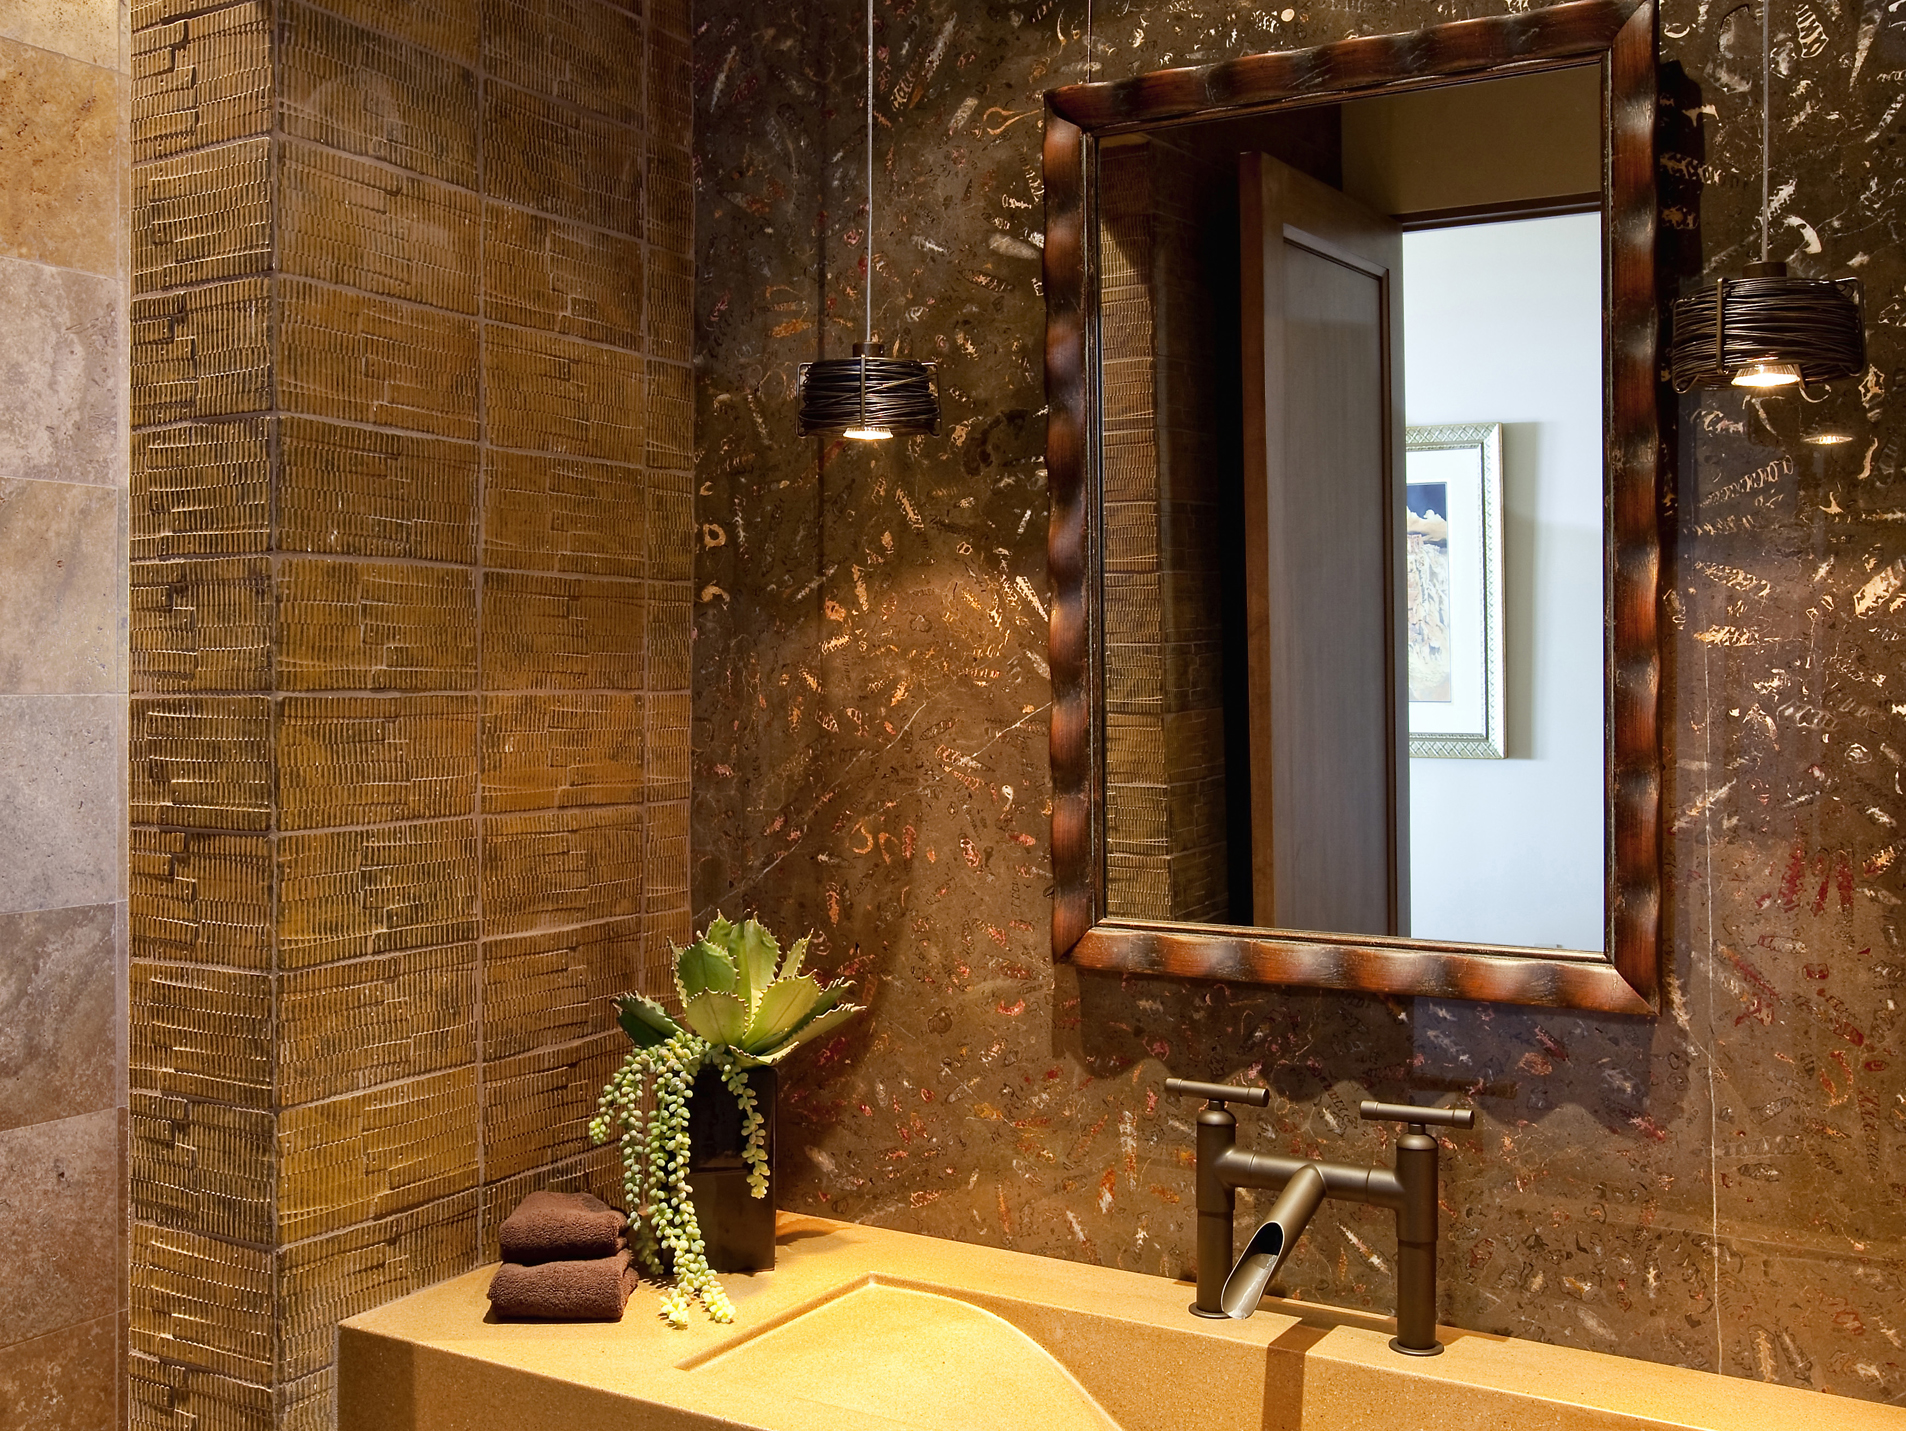 Cool 1 X 1 Acoustic Ceiling Tiles Big 12X12 Black Ceramic Tile Solid 12X12 Ceiling Tiles Home Depot 2 Hour Fire Rated Ceiling Tiles Youthful 2 X 4 Ceramic Tile Green2 X 6 Subway Tile Backsplash Choosing A Bathroom Backsplash | HGTV